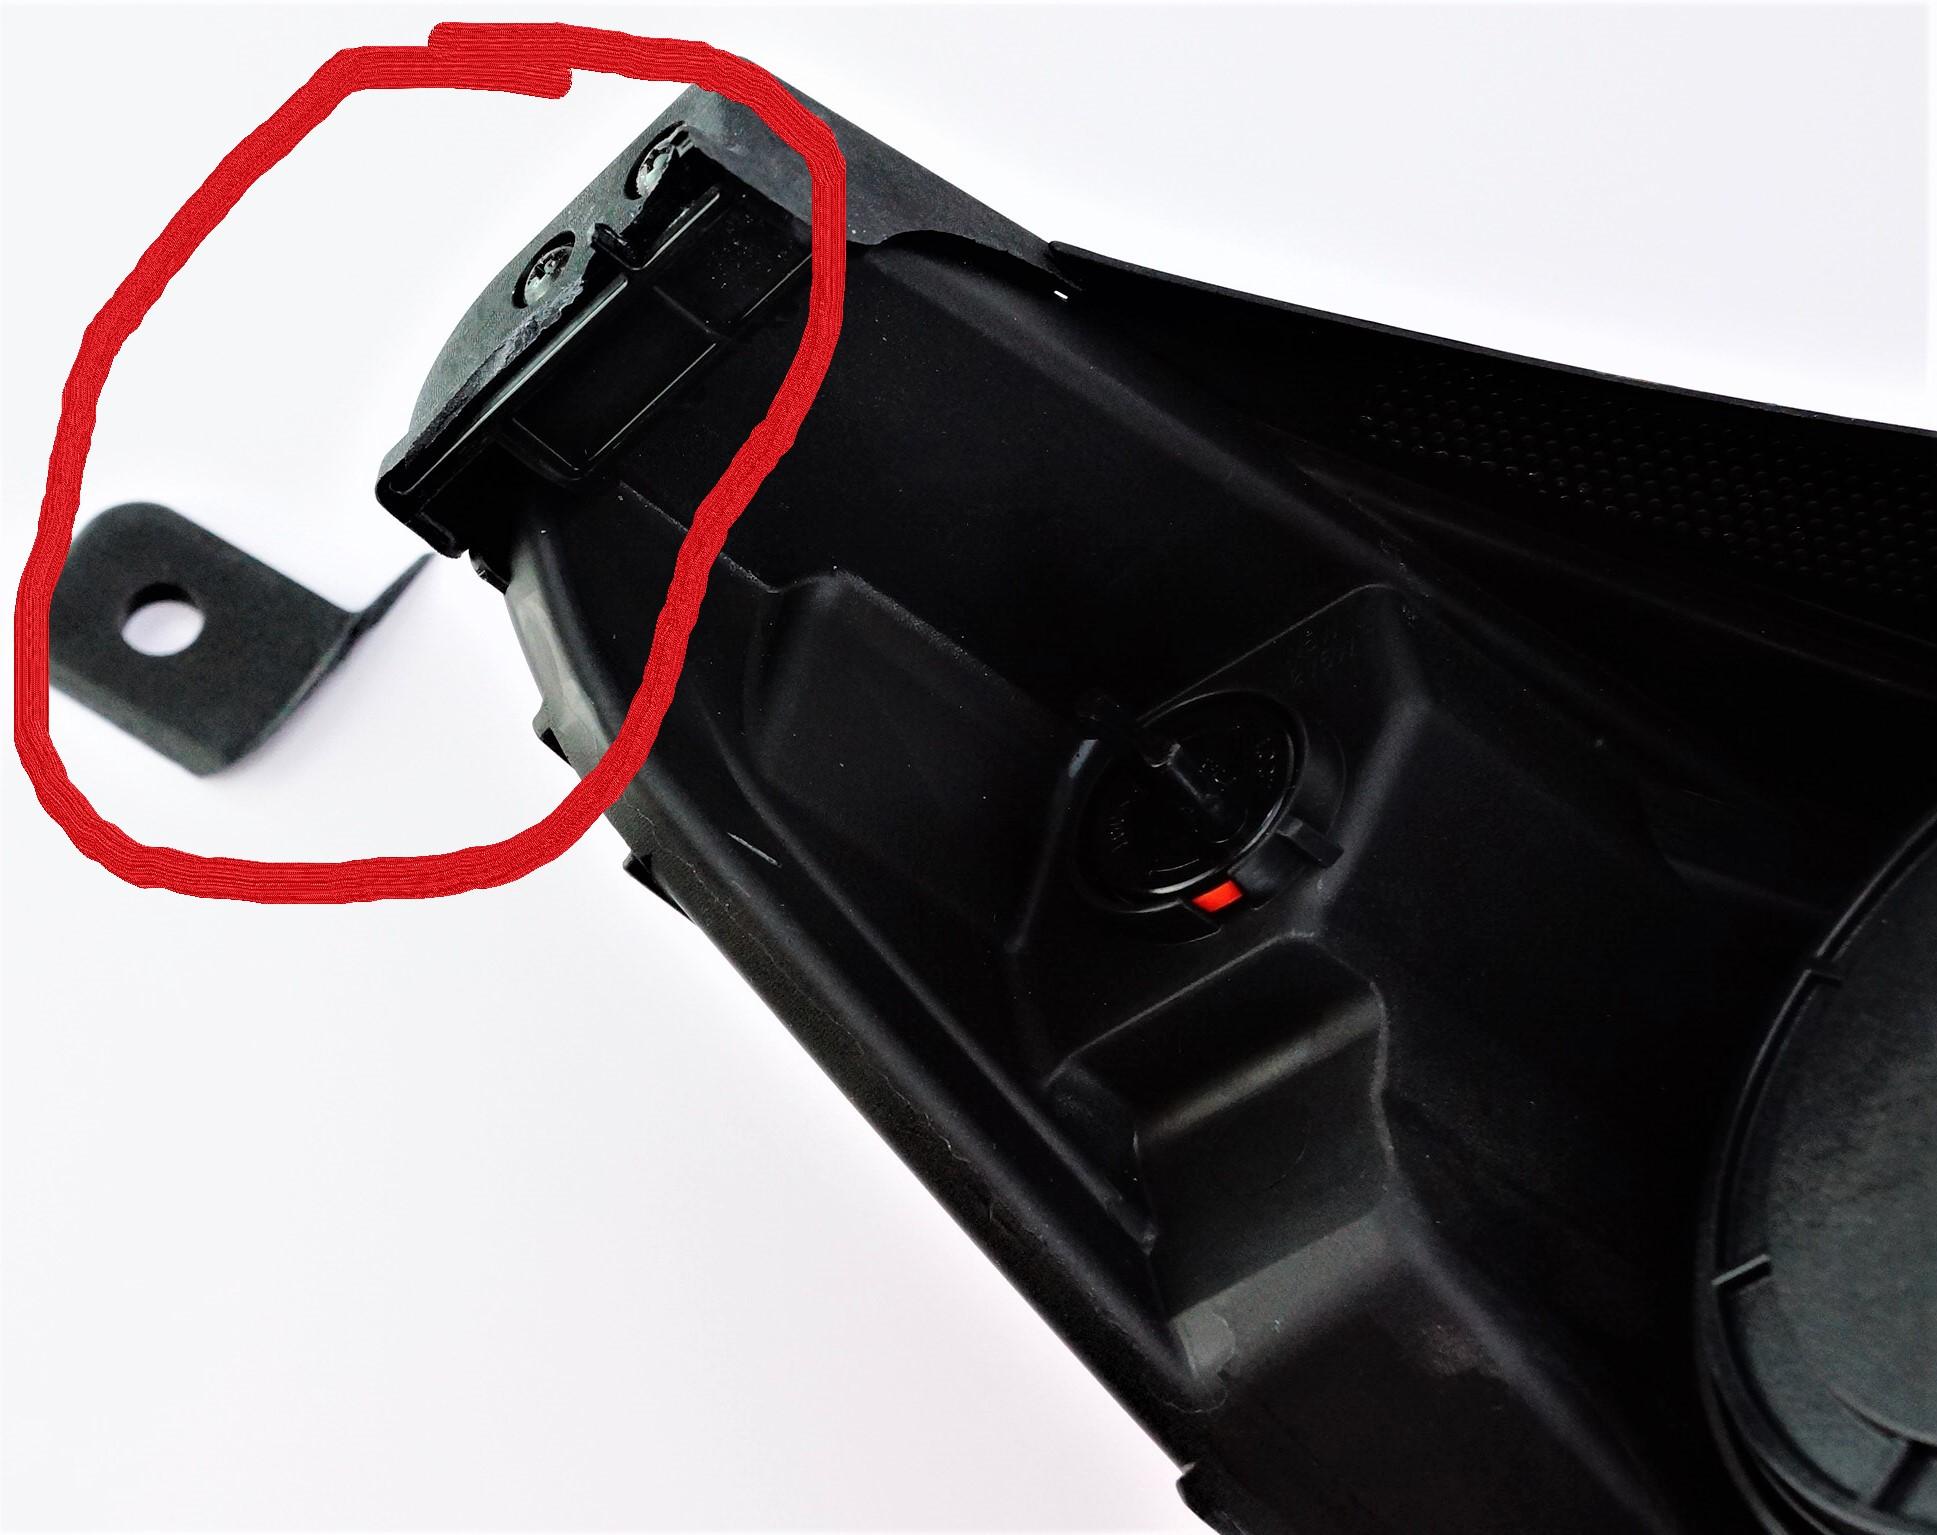 New Genuine OEM 92101-B2050 Driver Side Left Kia Headlight Assembly Damaged - image 3